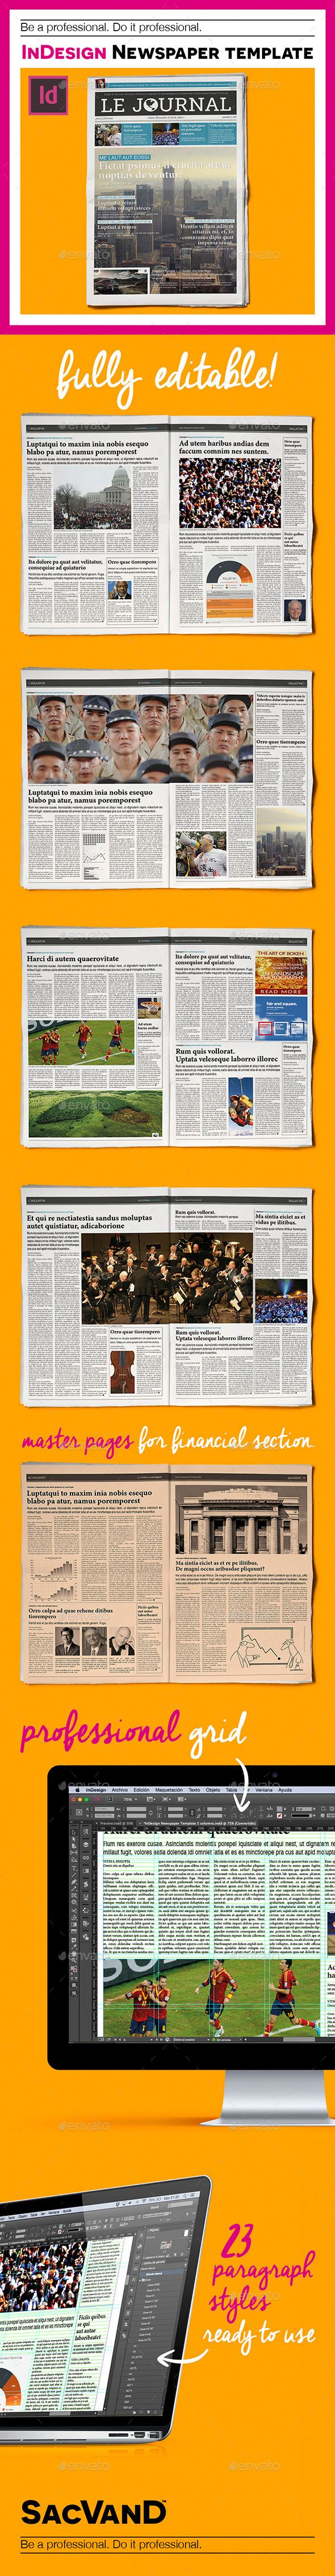 InDesign Newspaper Template 5 Columns